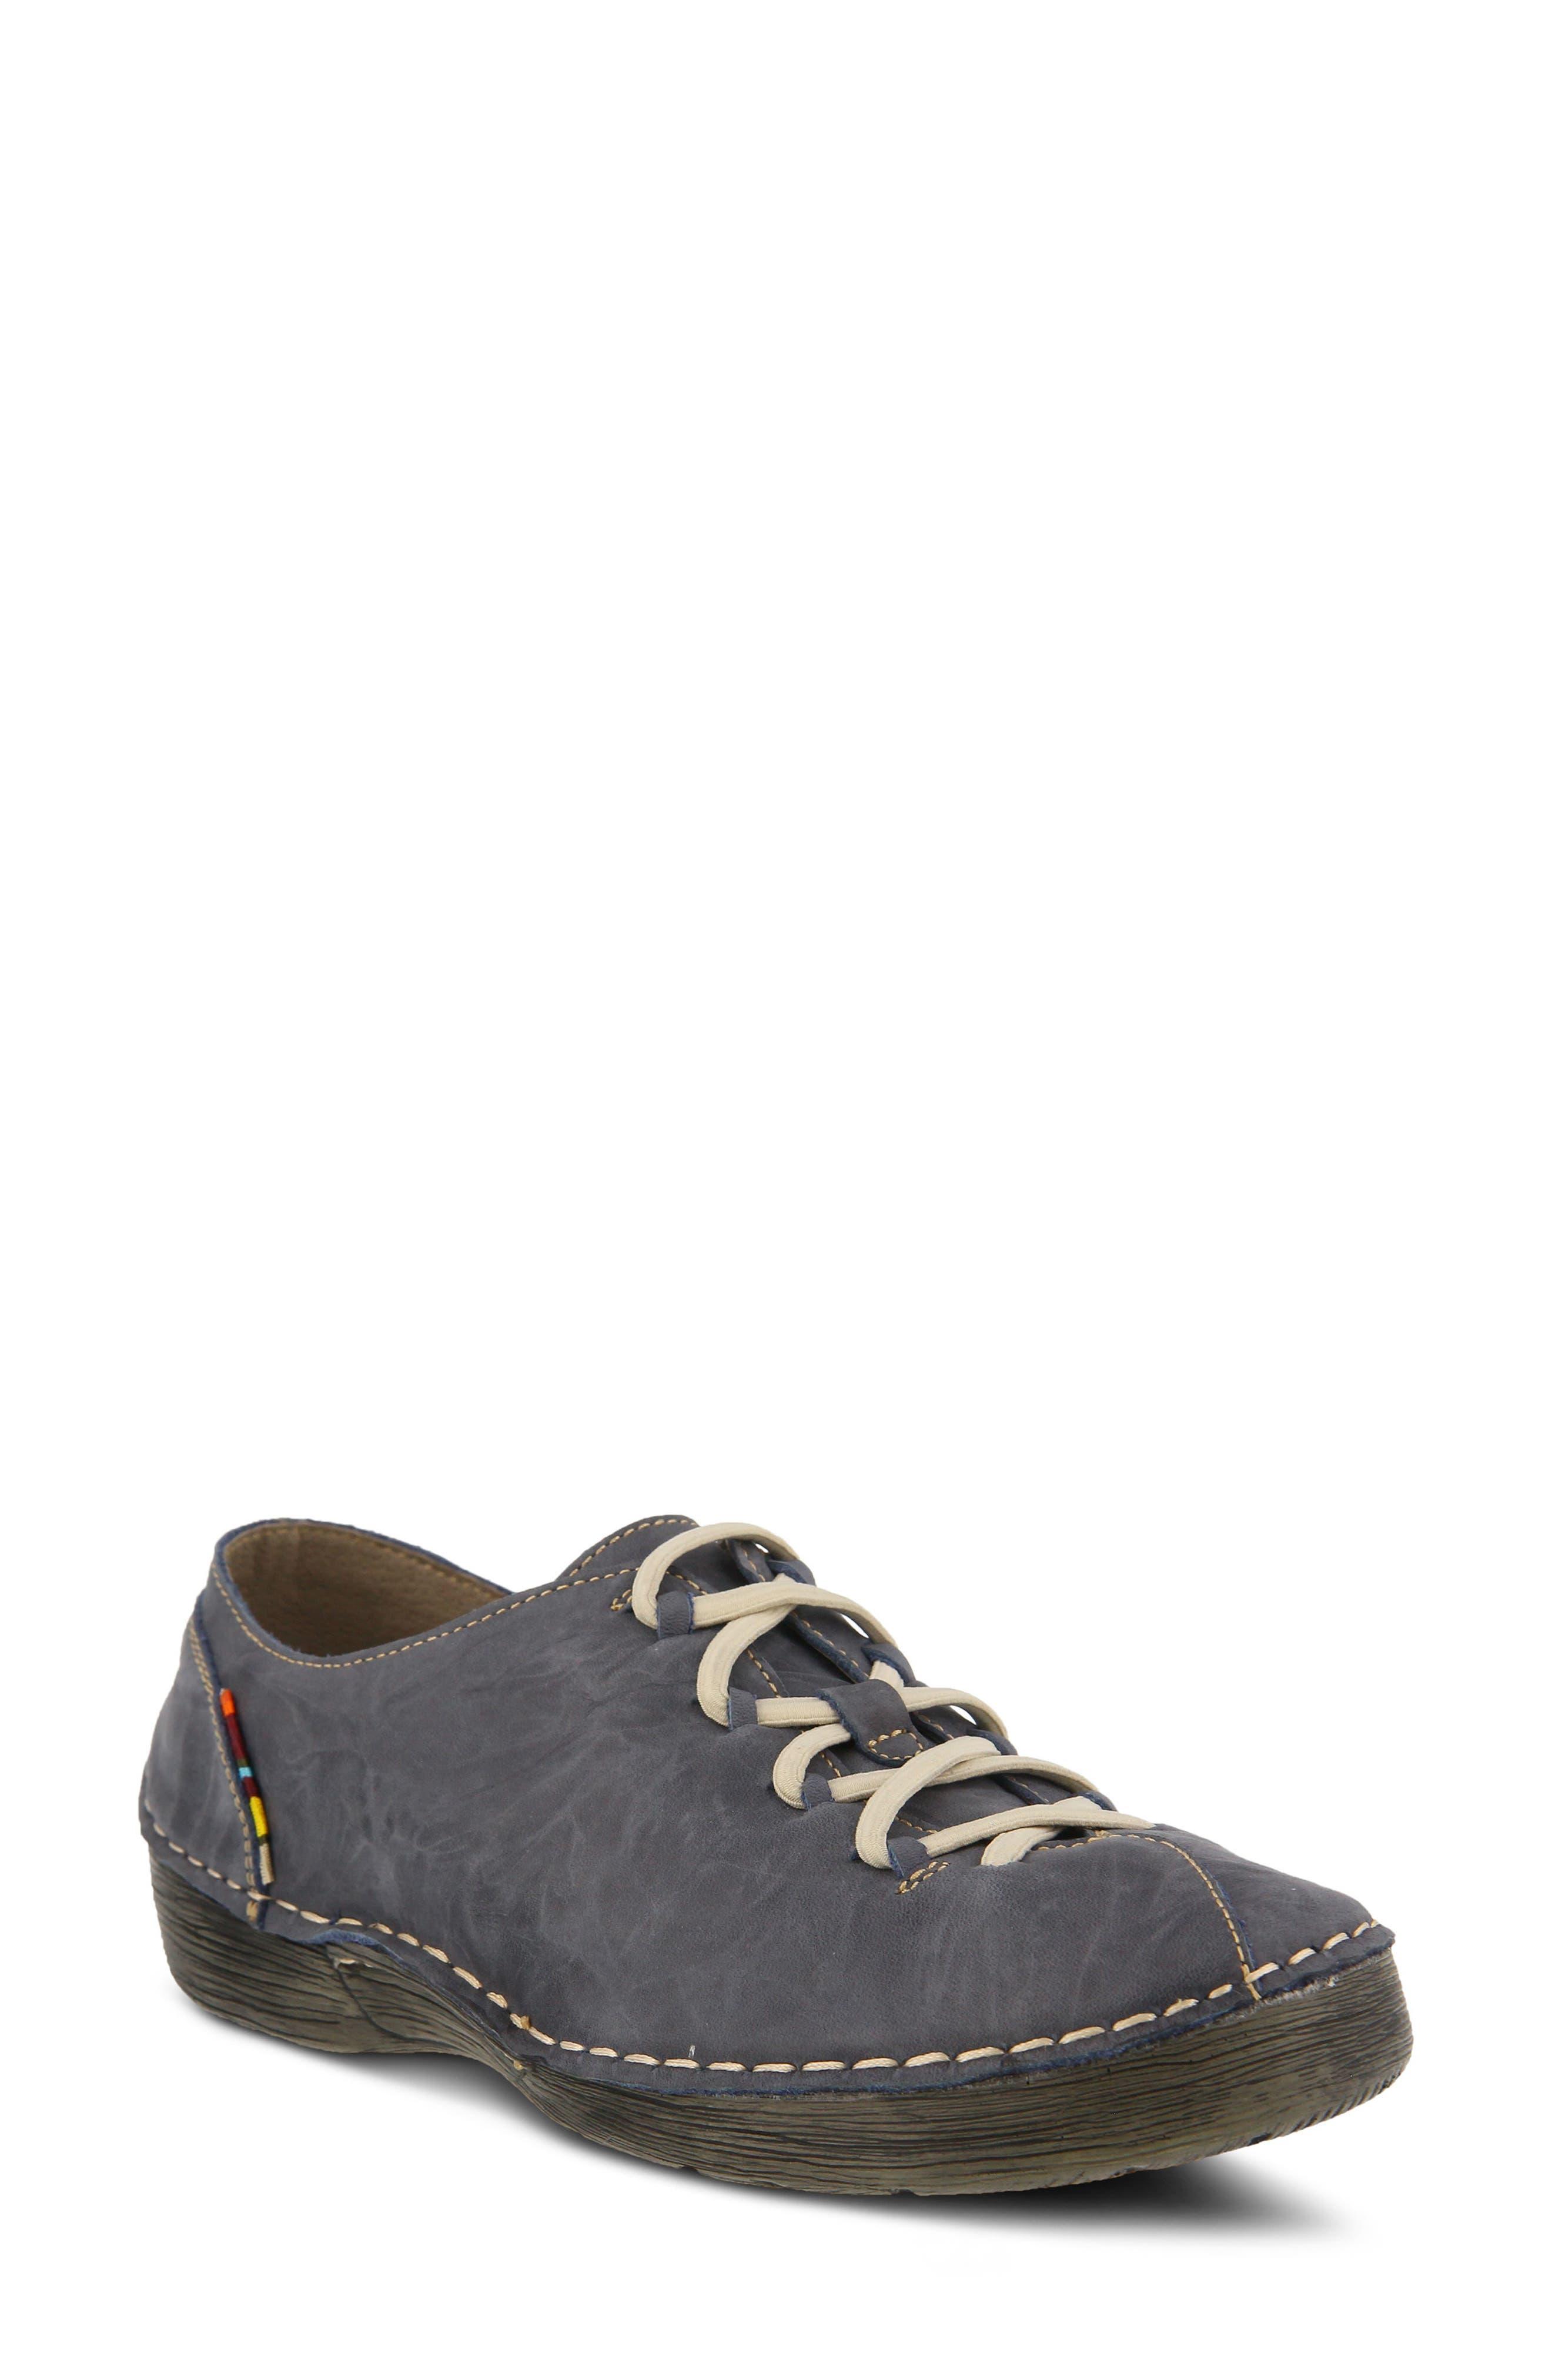 Carhop Sneaker,                             Main thumbnail 1, color,                             Blue Leather